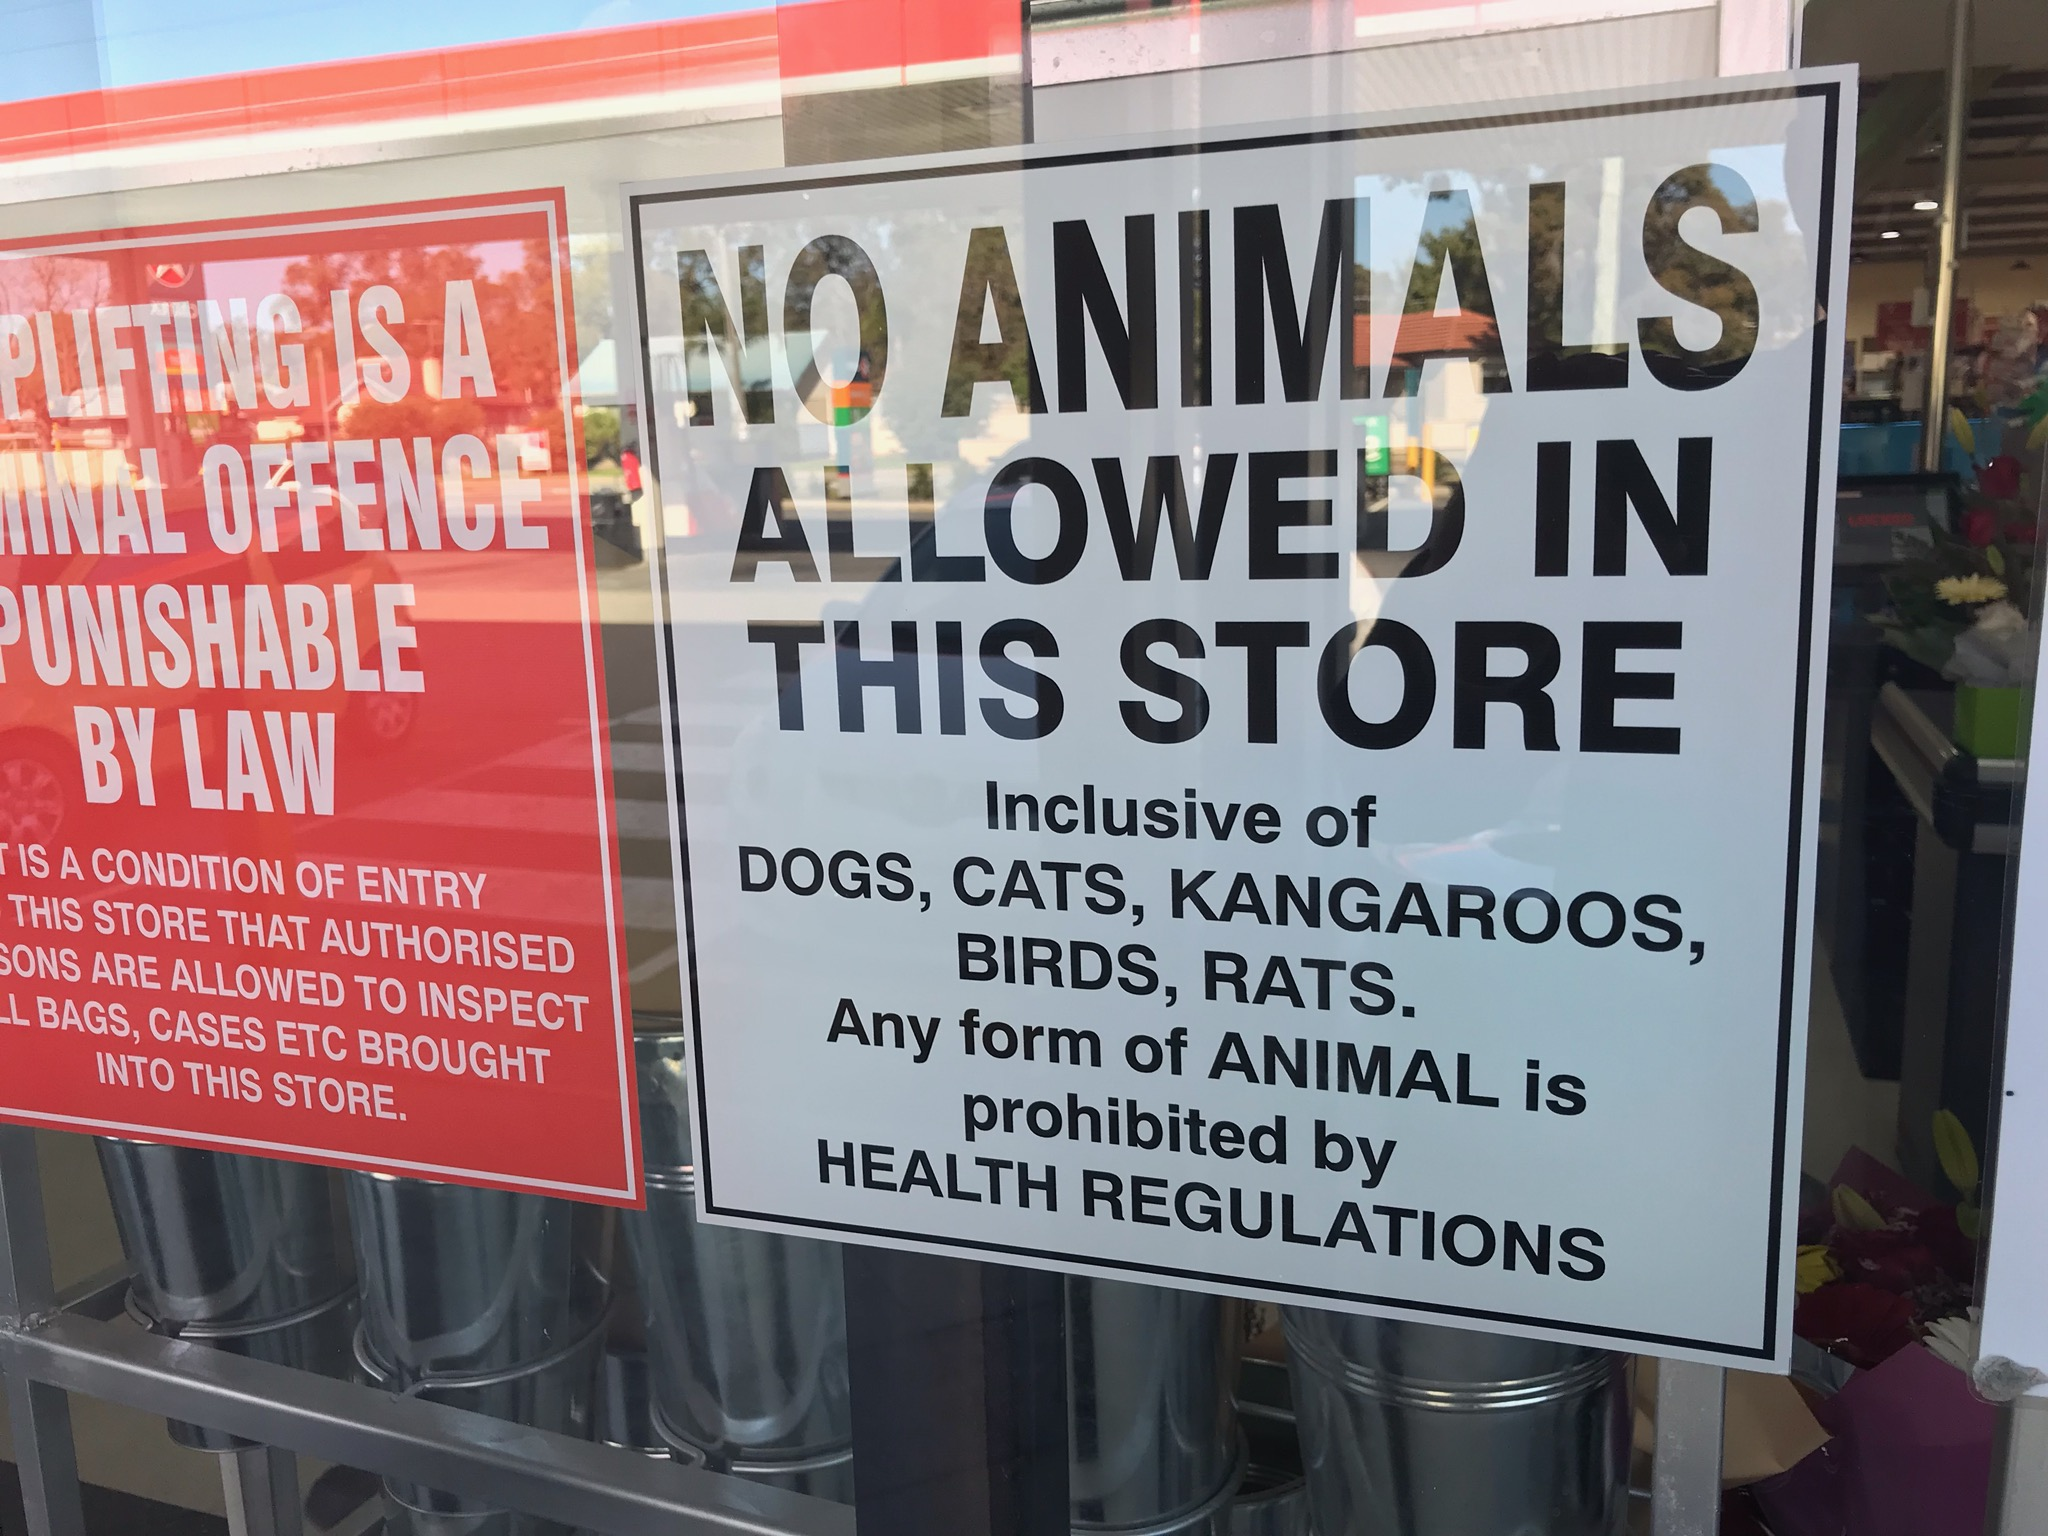 IGA Store's  sign  bans animals and for good reason.